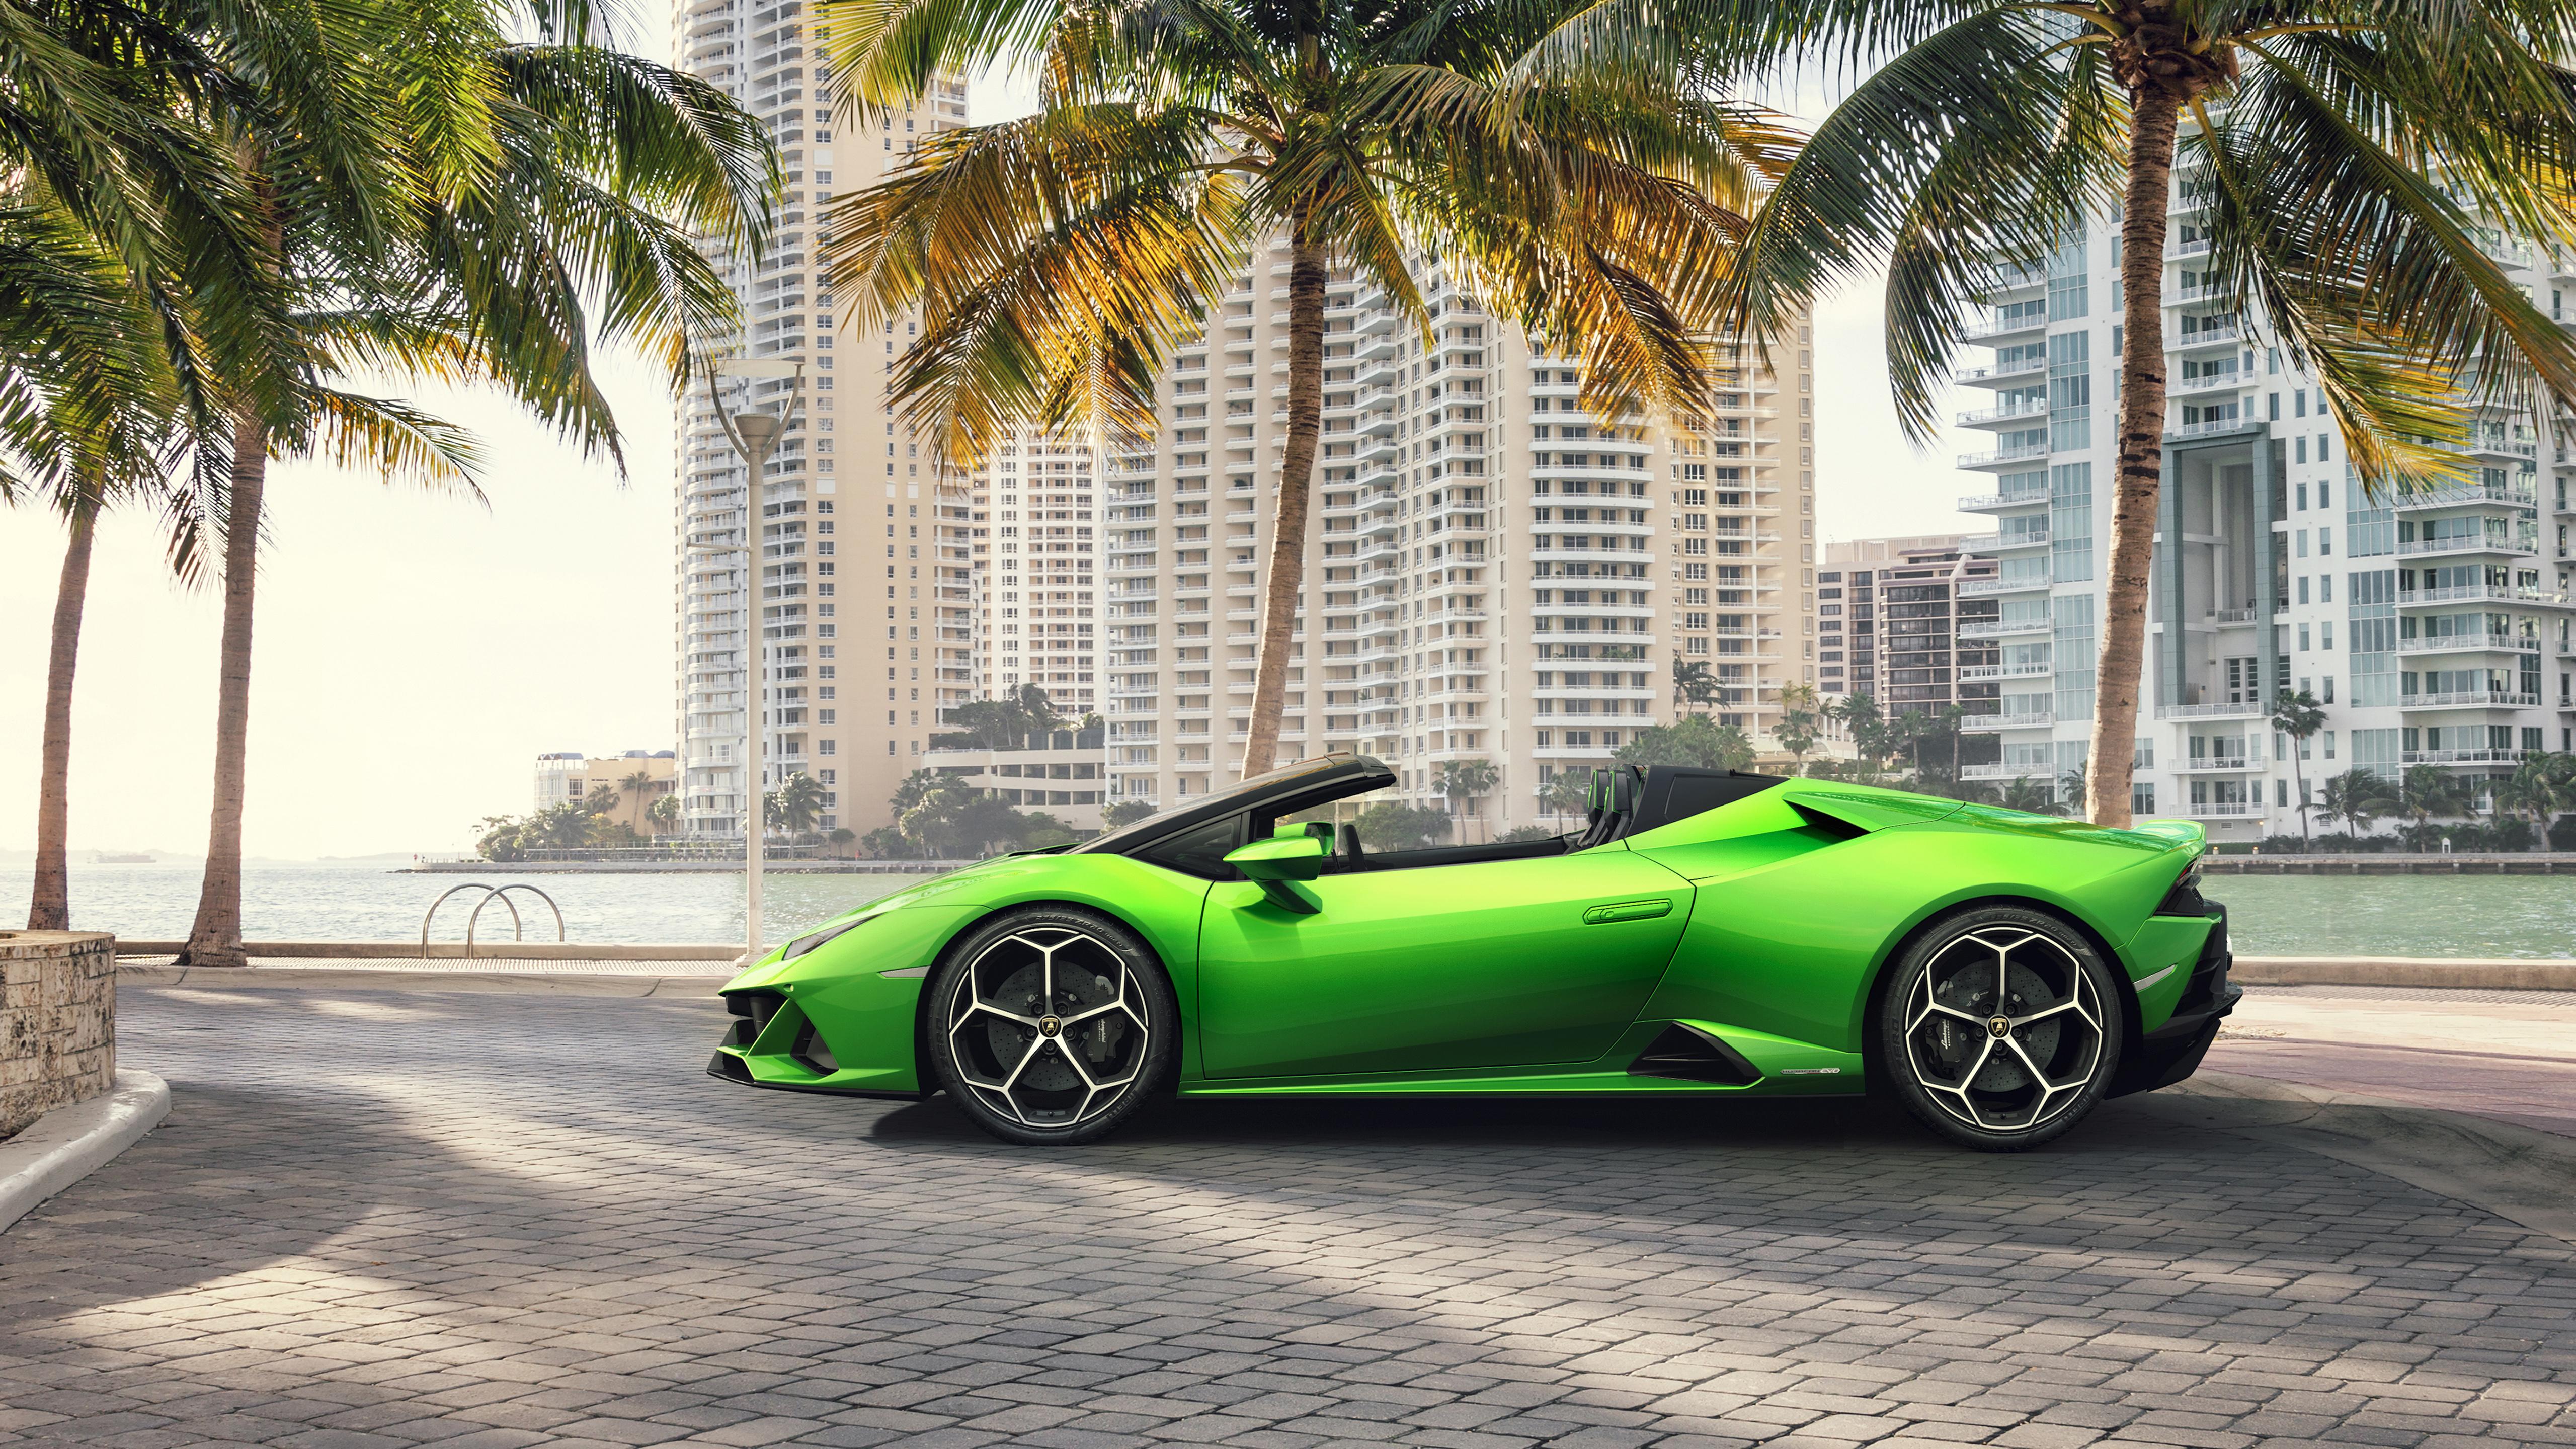 Lamborghini Huracan Evo Spyder 2019 5k 2 Wallpaper Hd Car